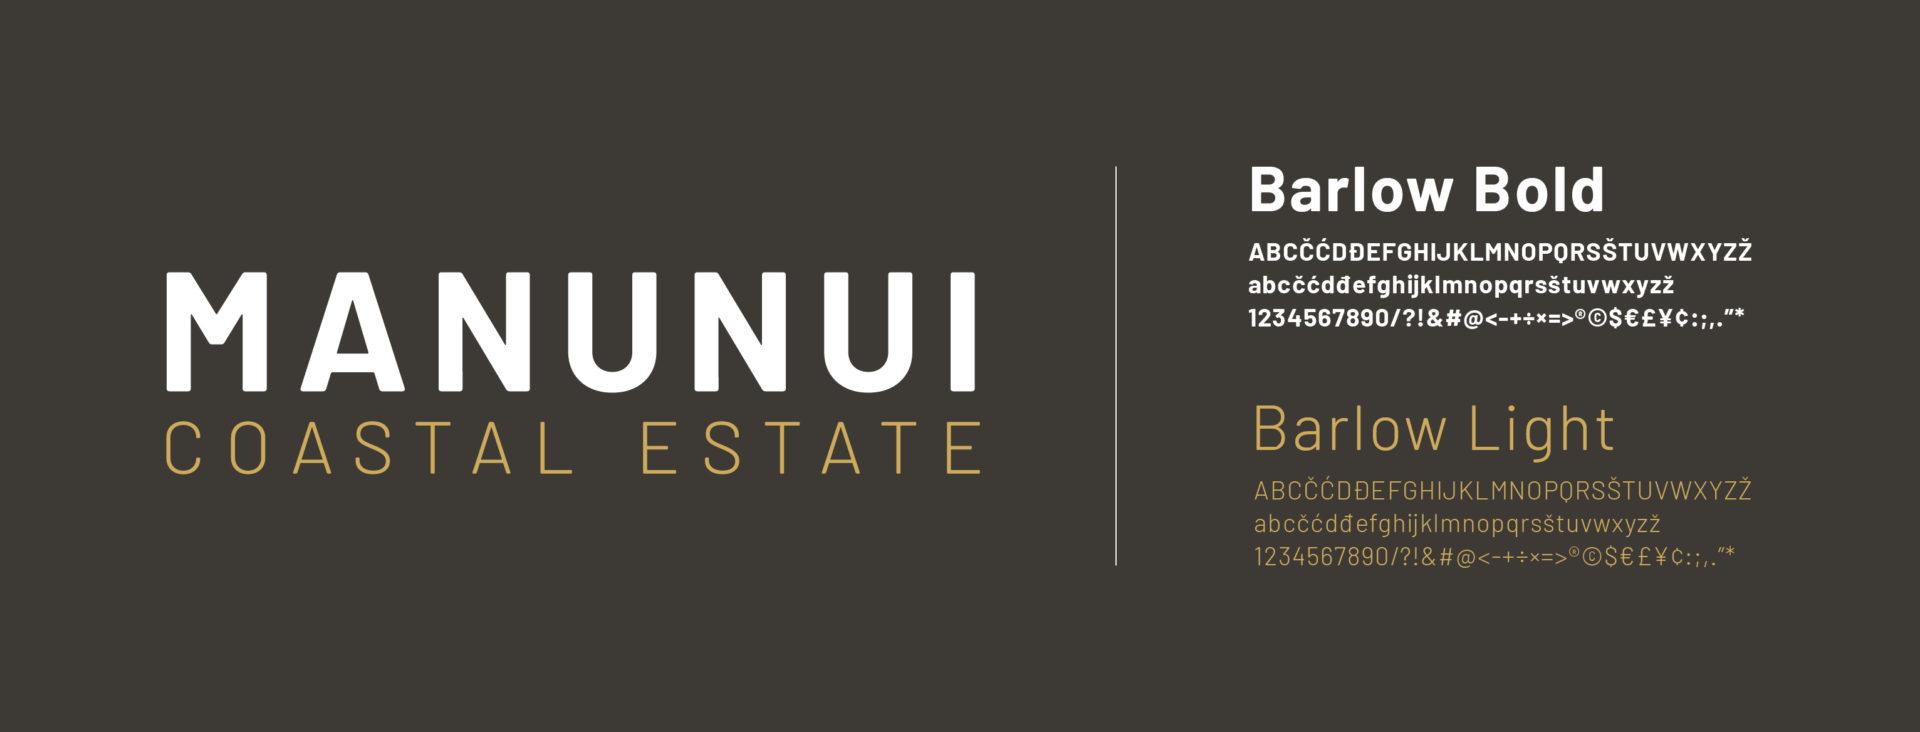 Manunui logo font typography